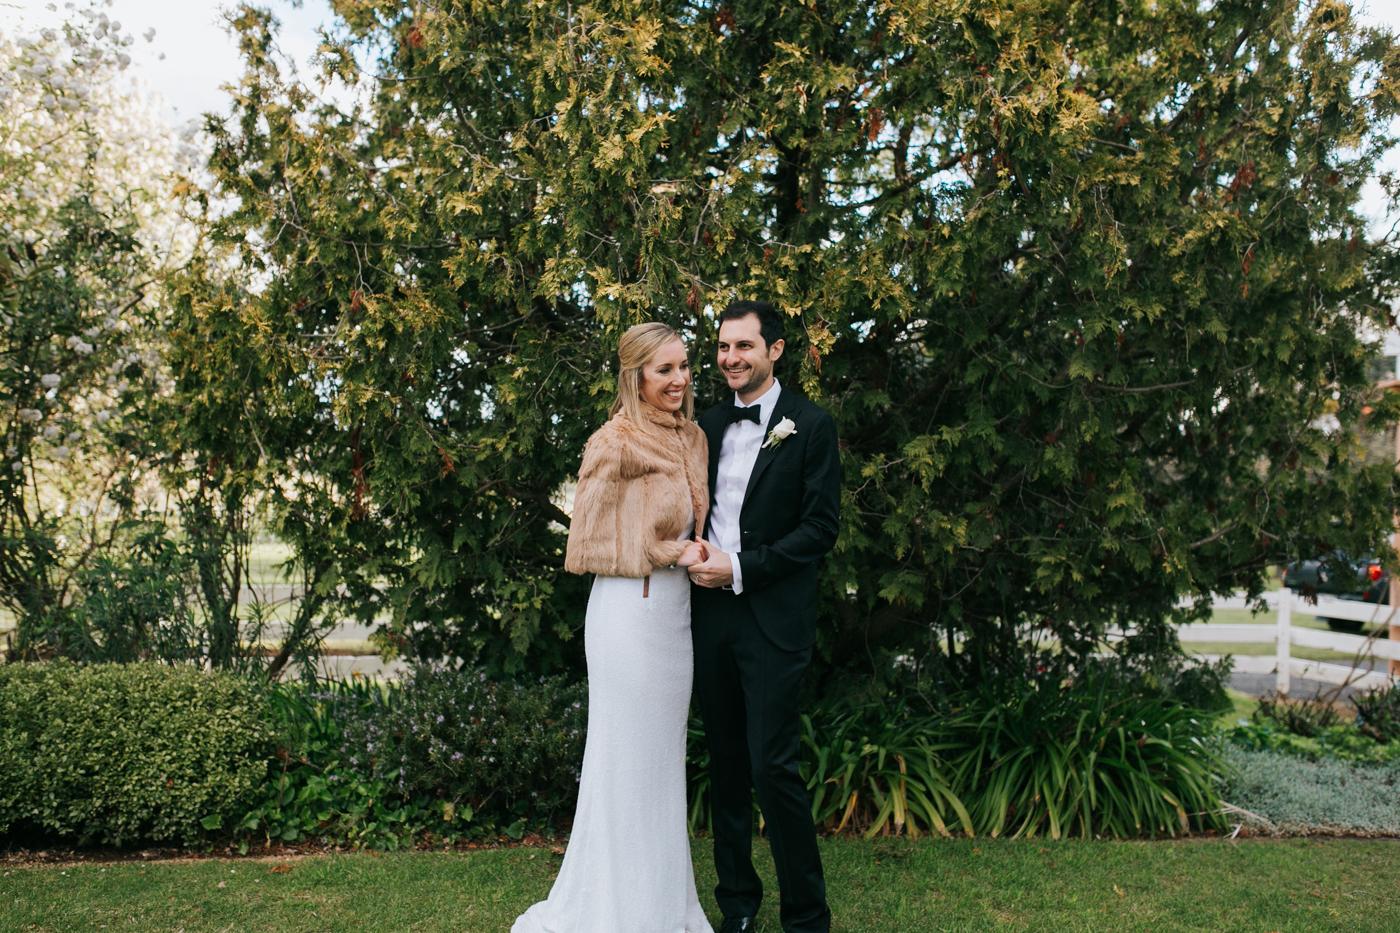 Bridget & James - Orange Country Wedding - Samantha Heather Photography-165.jpg